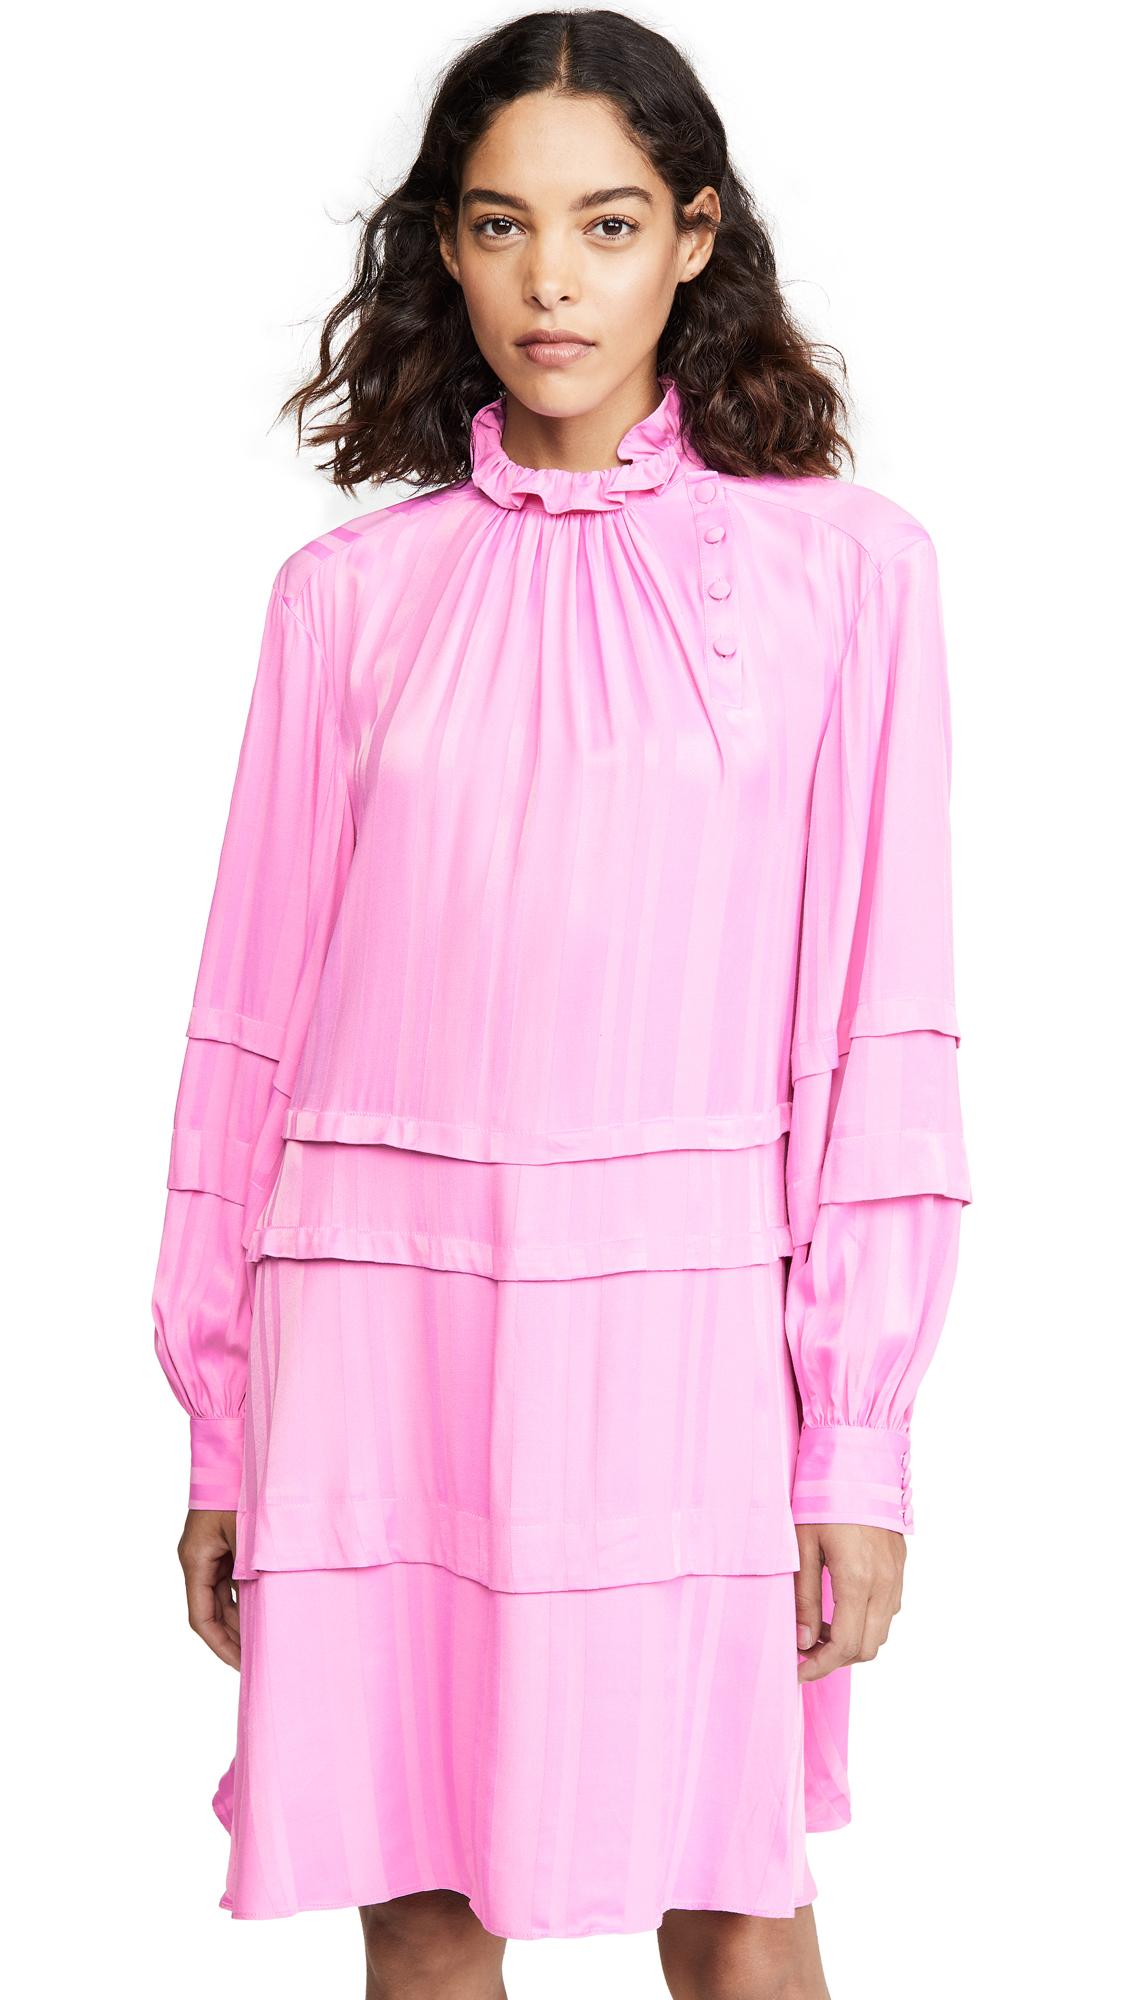 Hofmann Copenhagen Manon Dress - 50% Off Sale